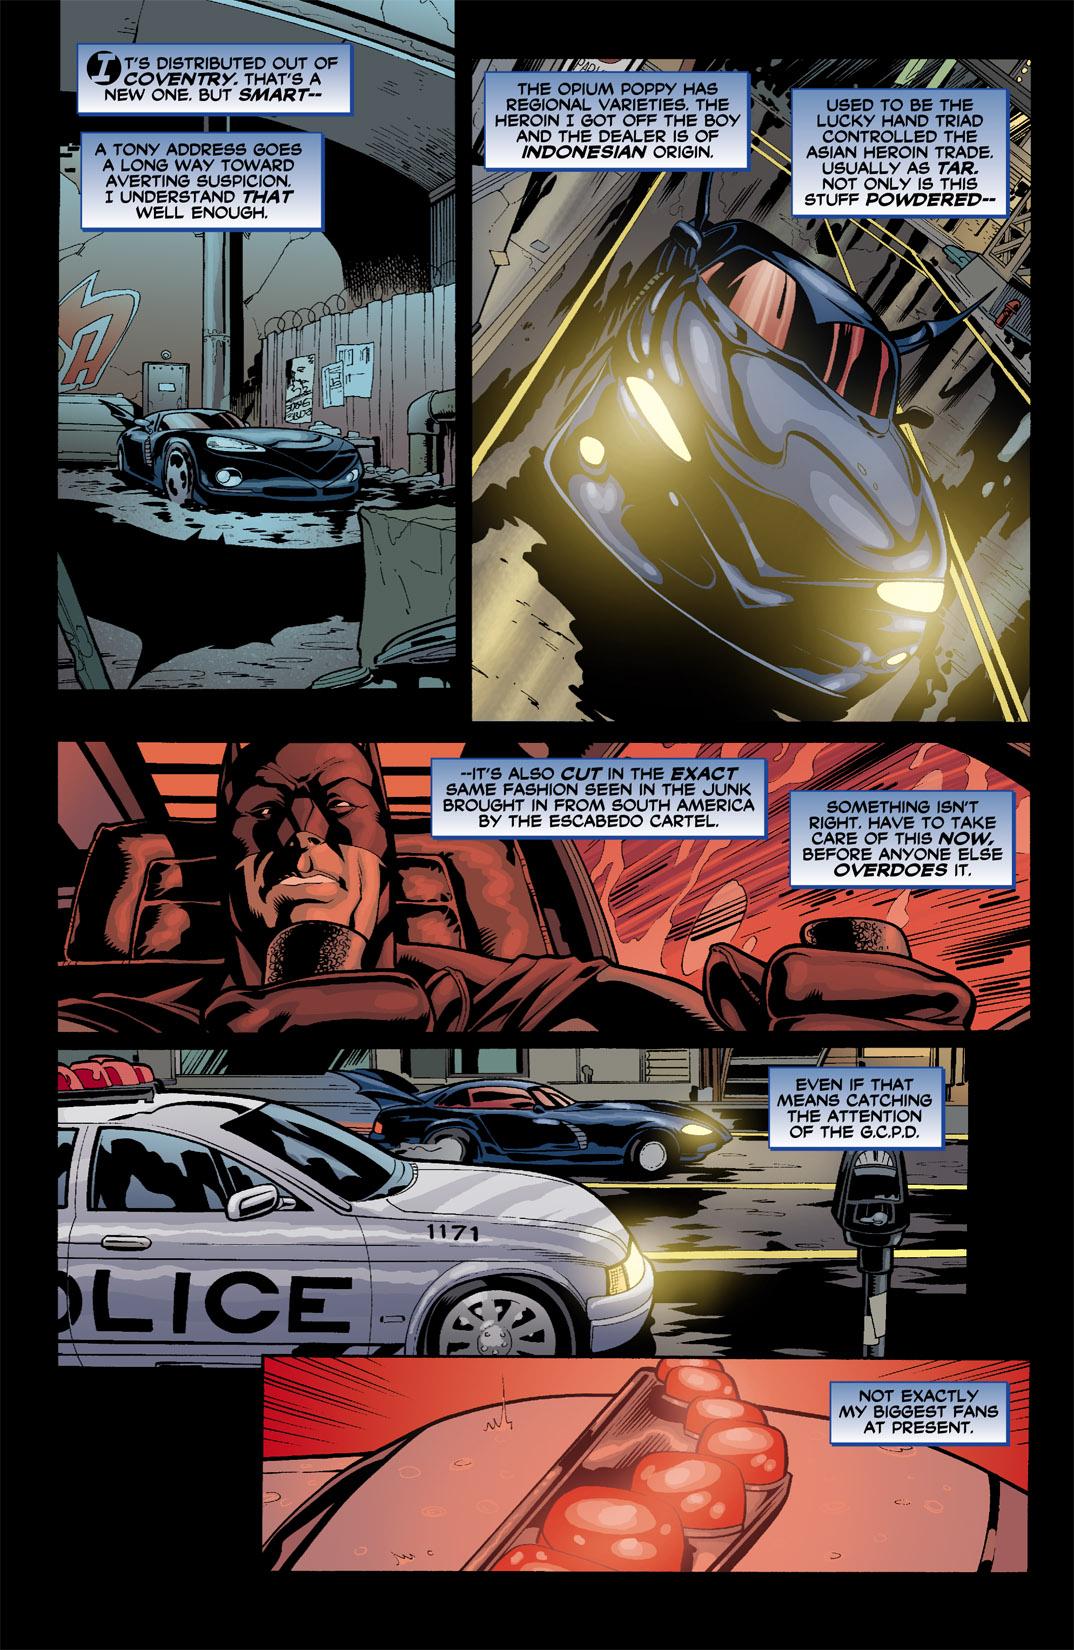 Detective Comics (1937) 800 Page 5